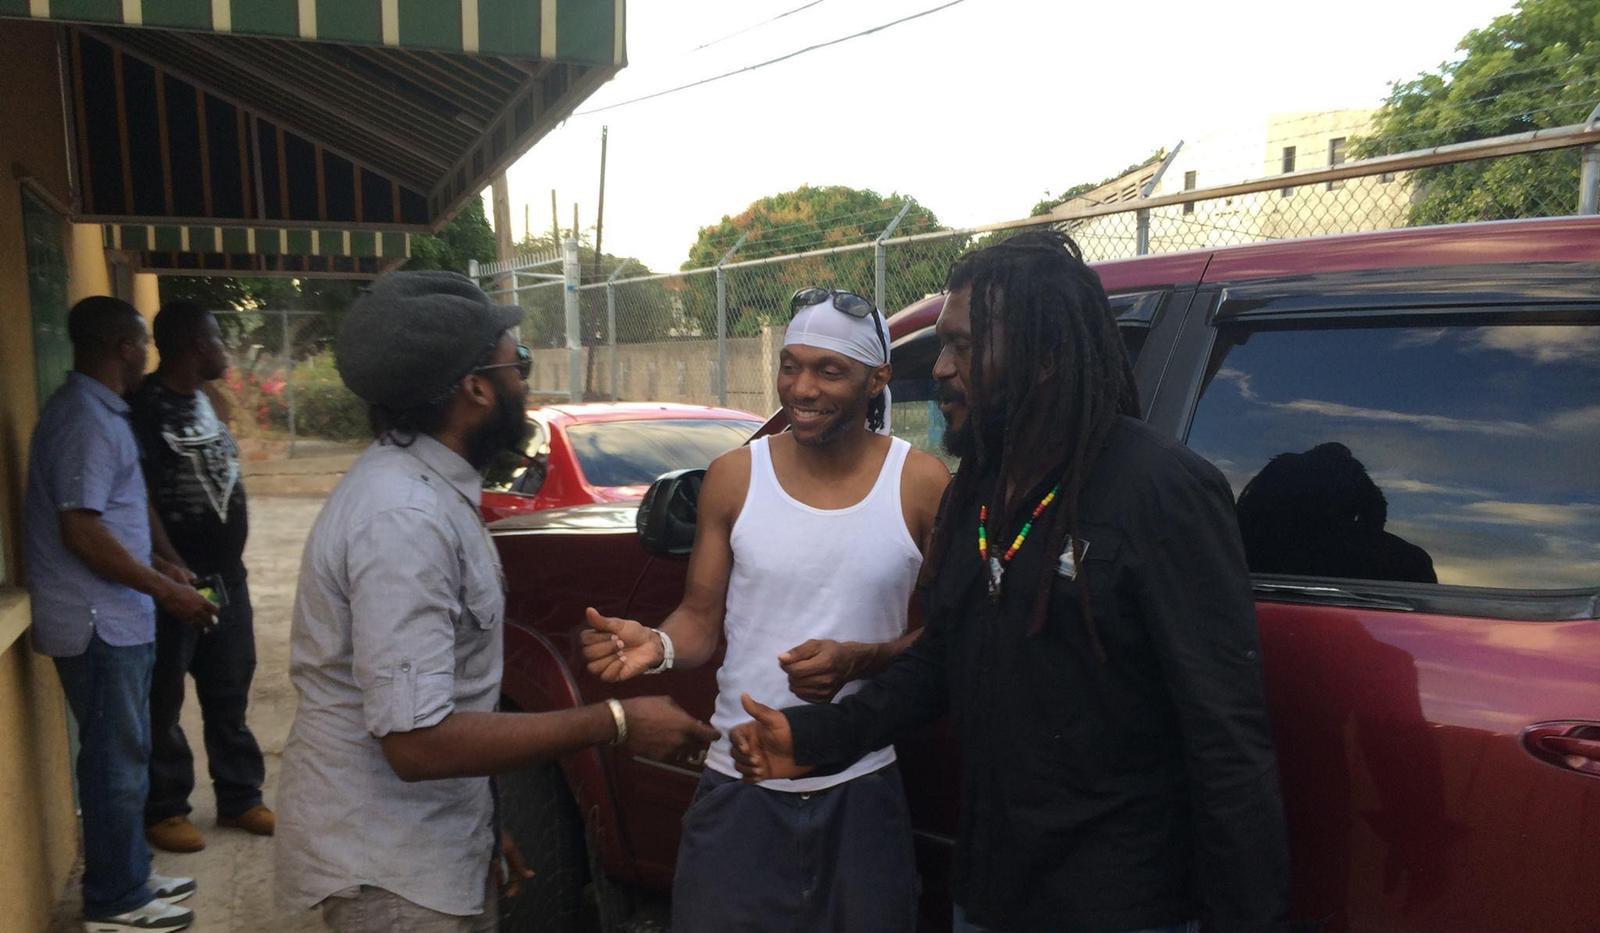 Seanie T & Chezidek, Tarrus Riley, Kinston Jamaica 2015